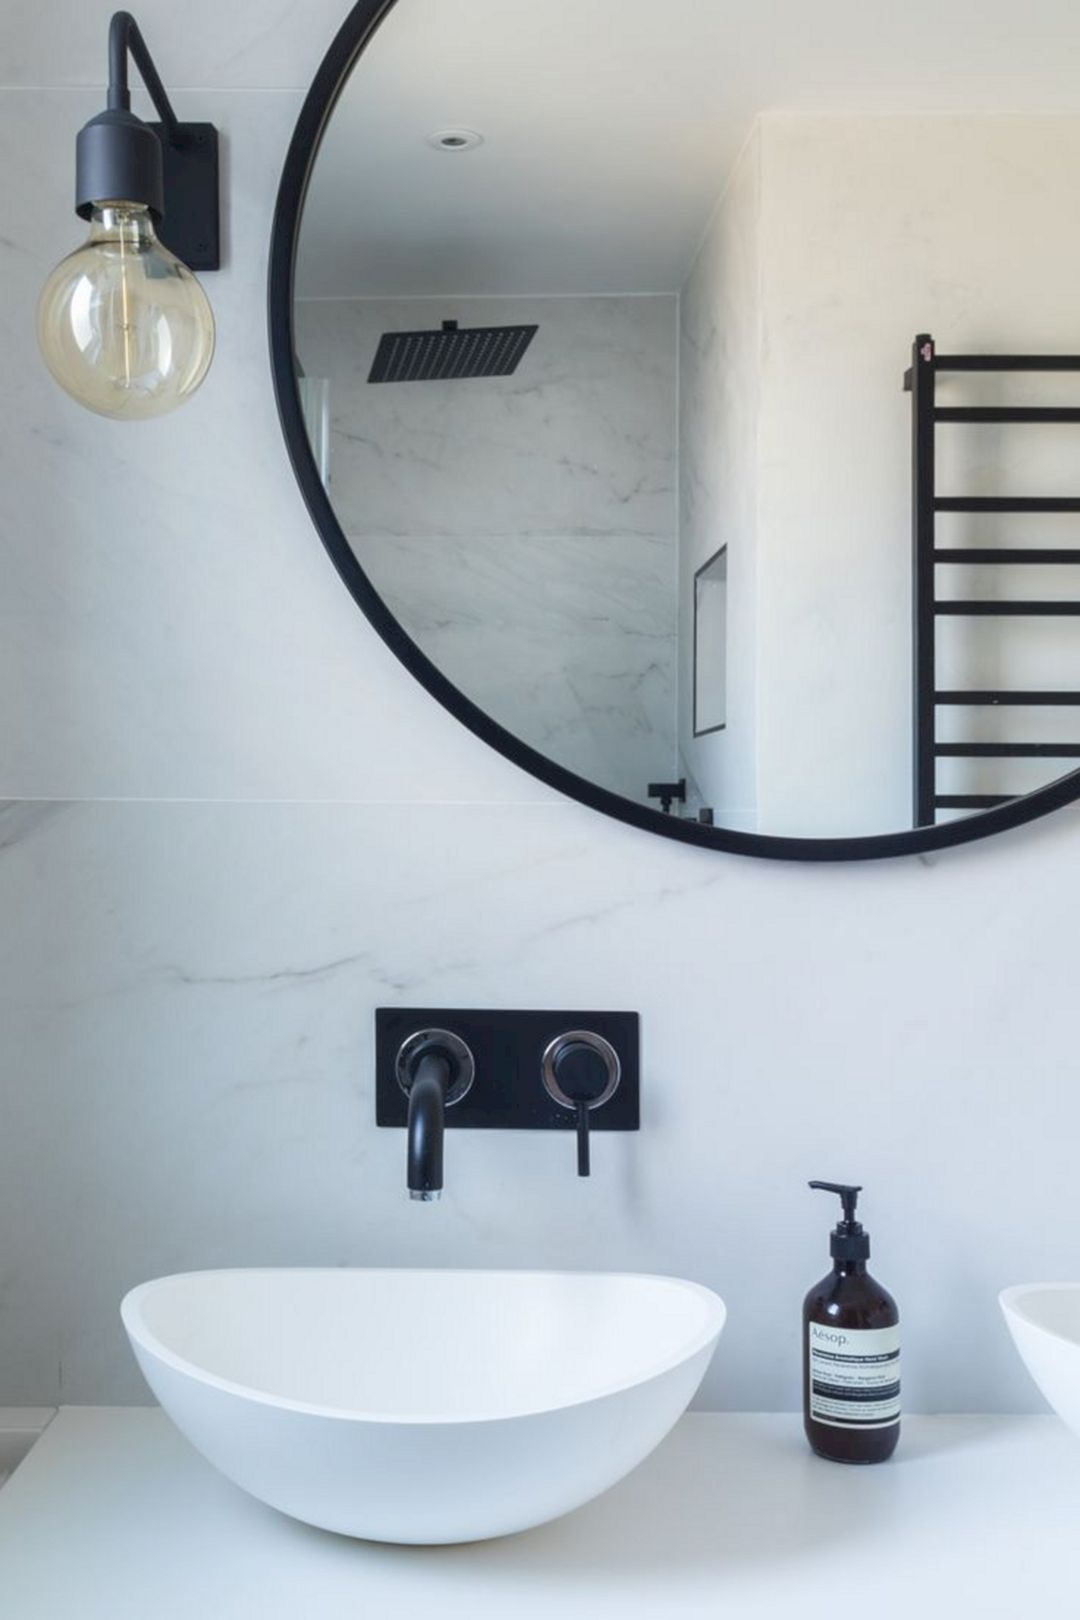 25 Gorgeous Bathroom Interior Industrialist Design Ideas Teracee Round Mirror Bathroom Bathroom Mirror Lights Trendy Bathroom [ 1620 x 1080 Pixel ]